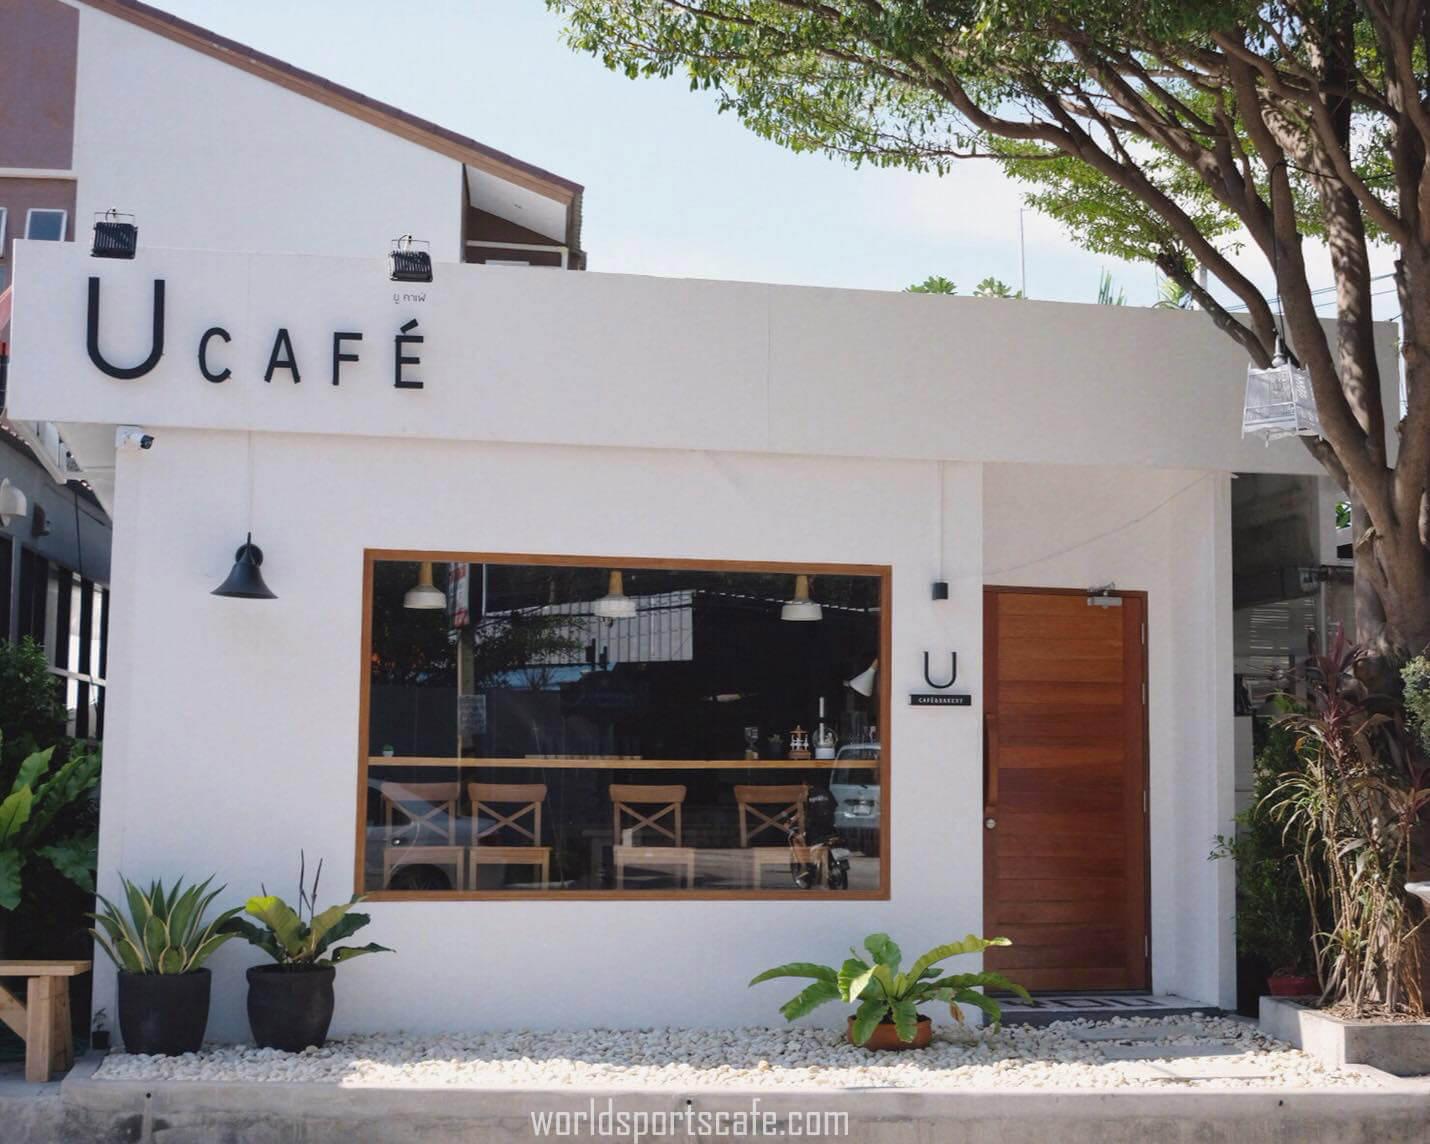 U Cafe & Bakery ร้านเล็กๆน่ารัก บางแสน